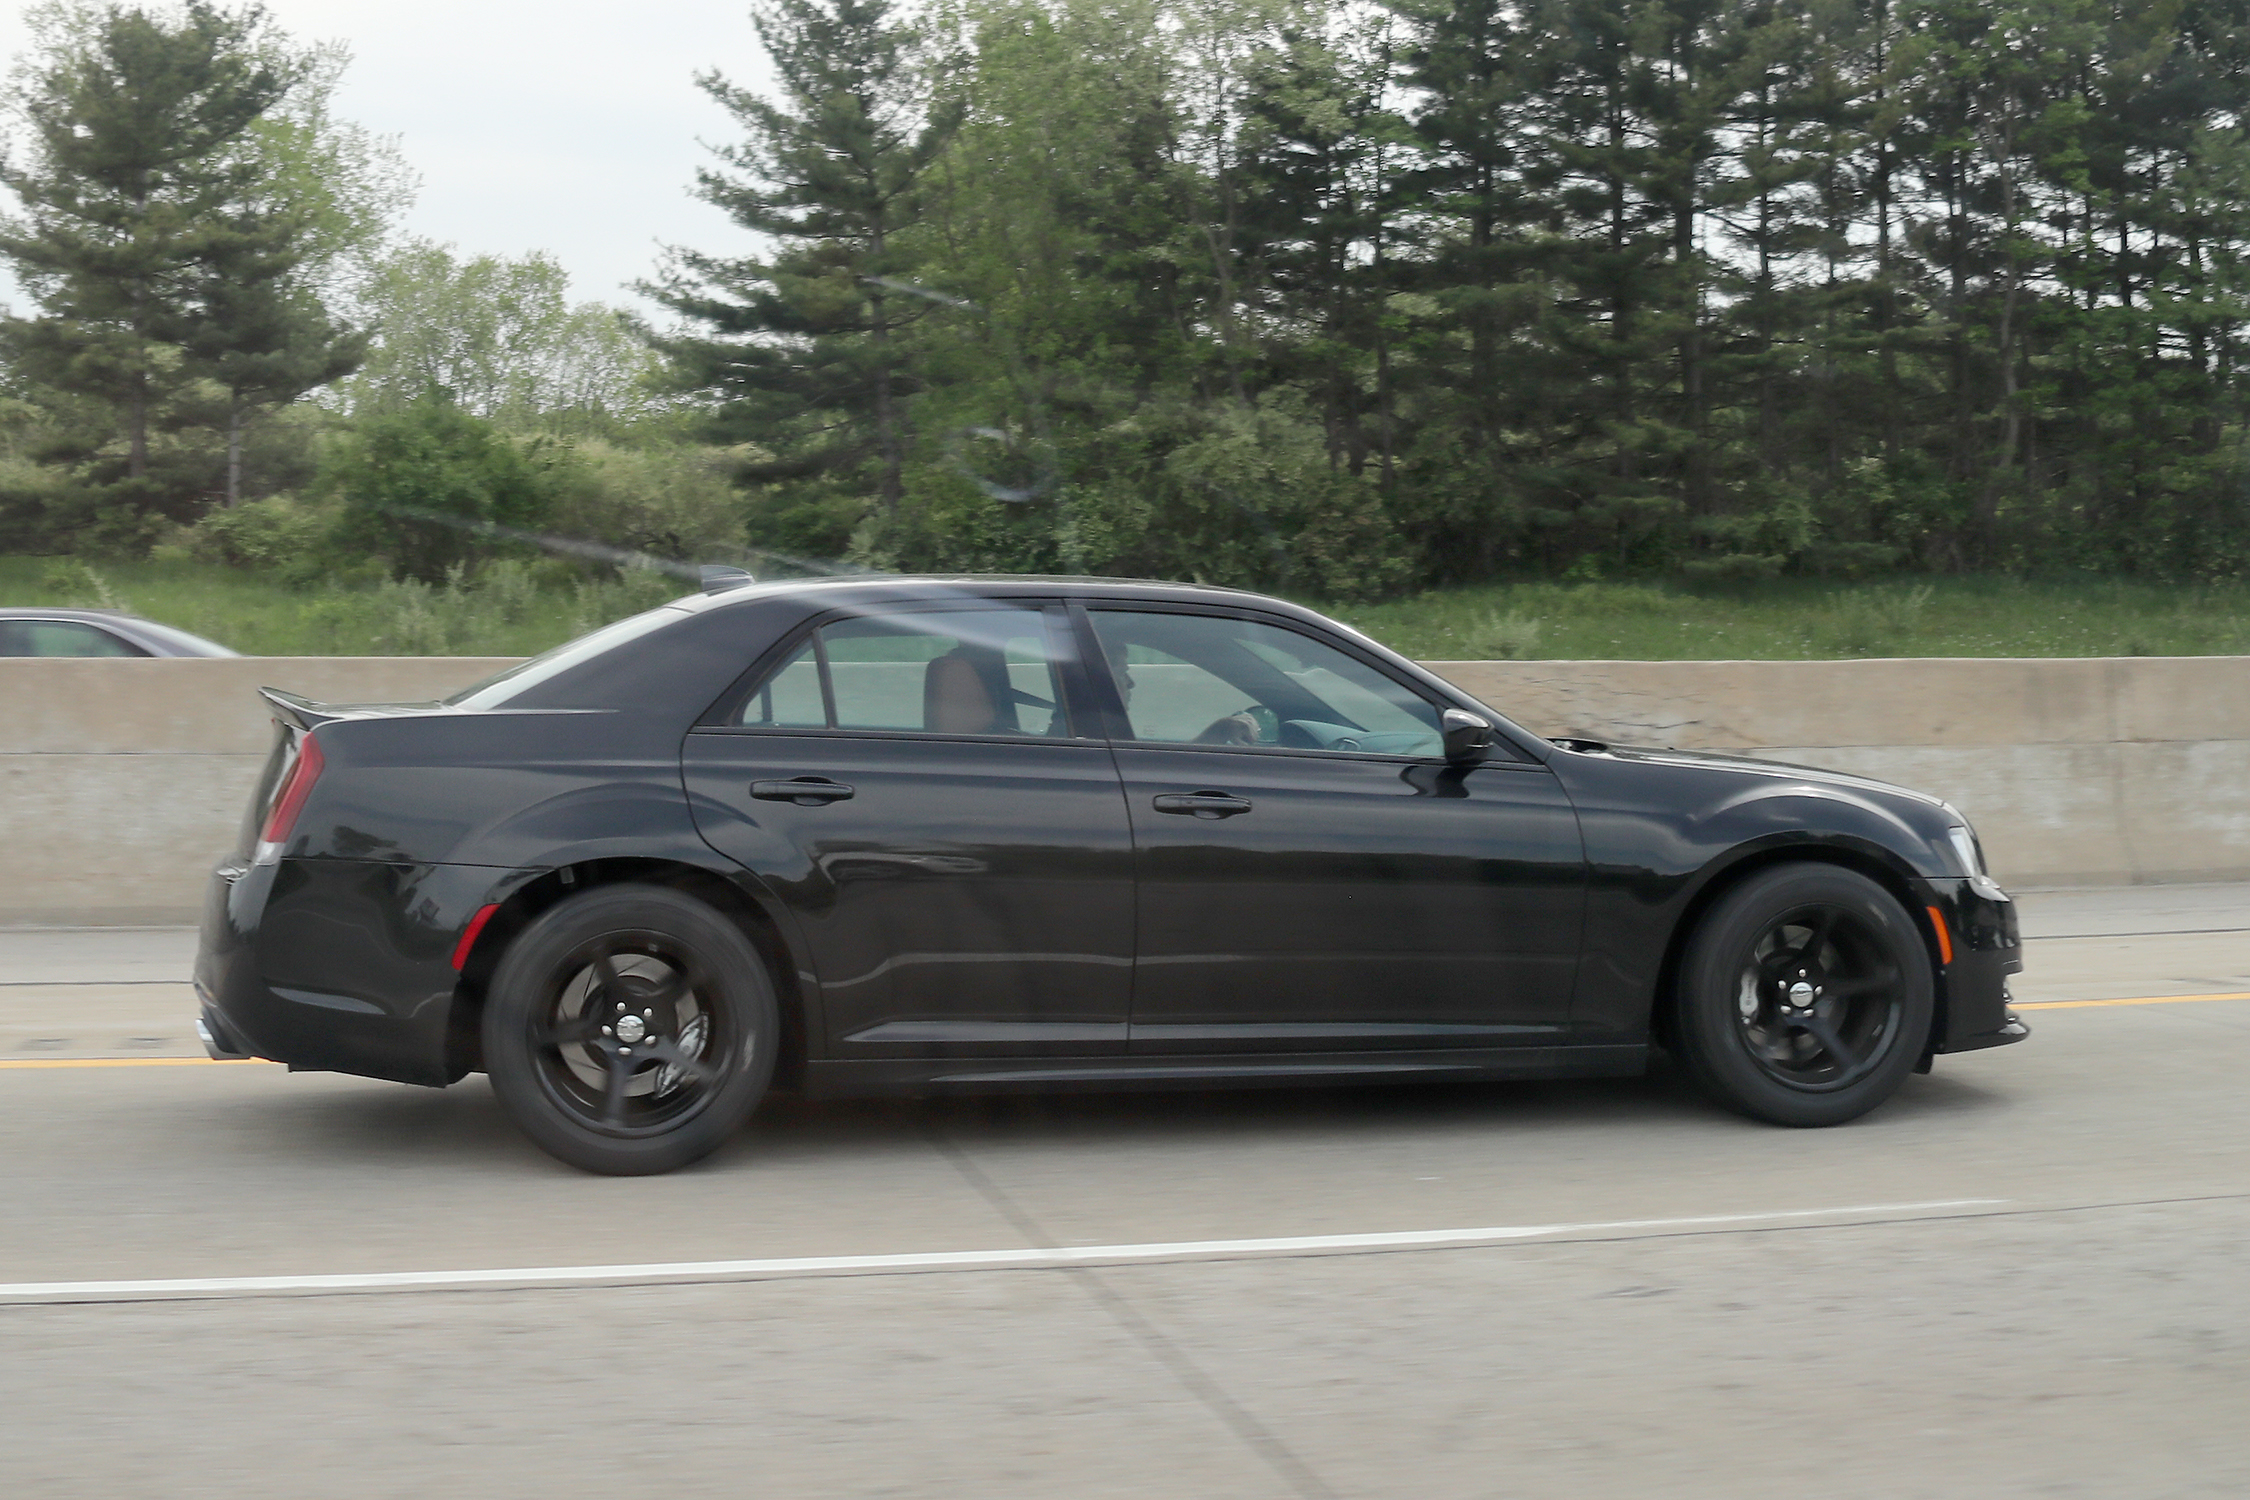 Chrysler 300 SRT widebody